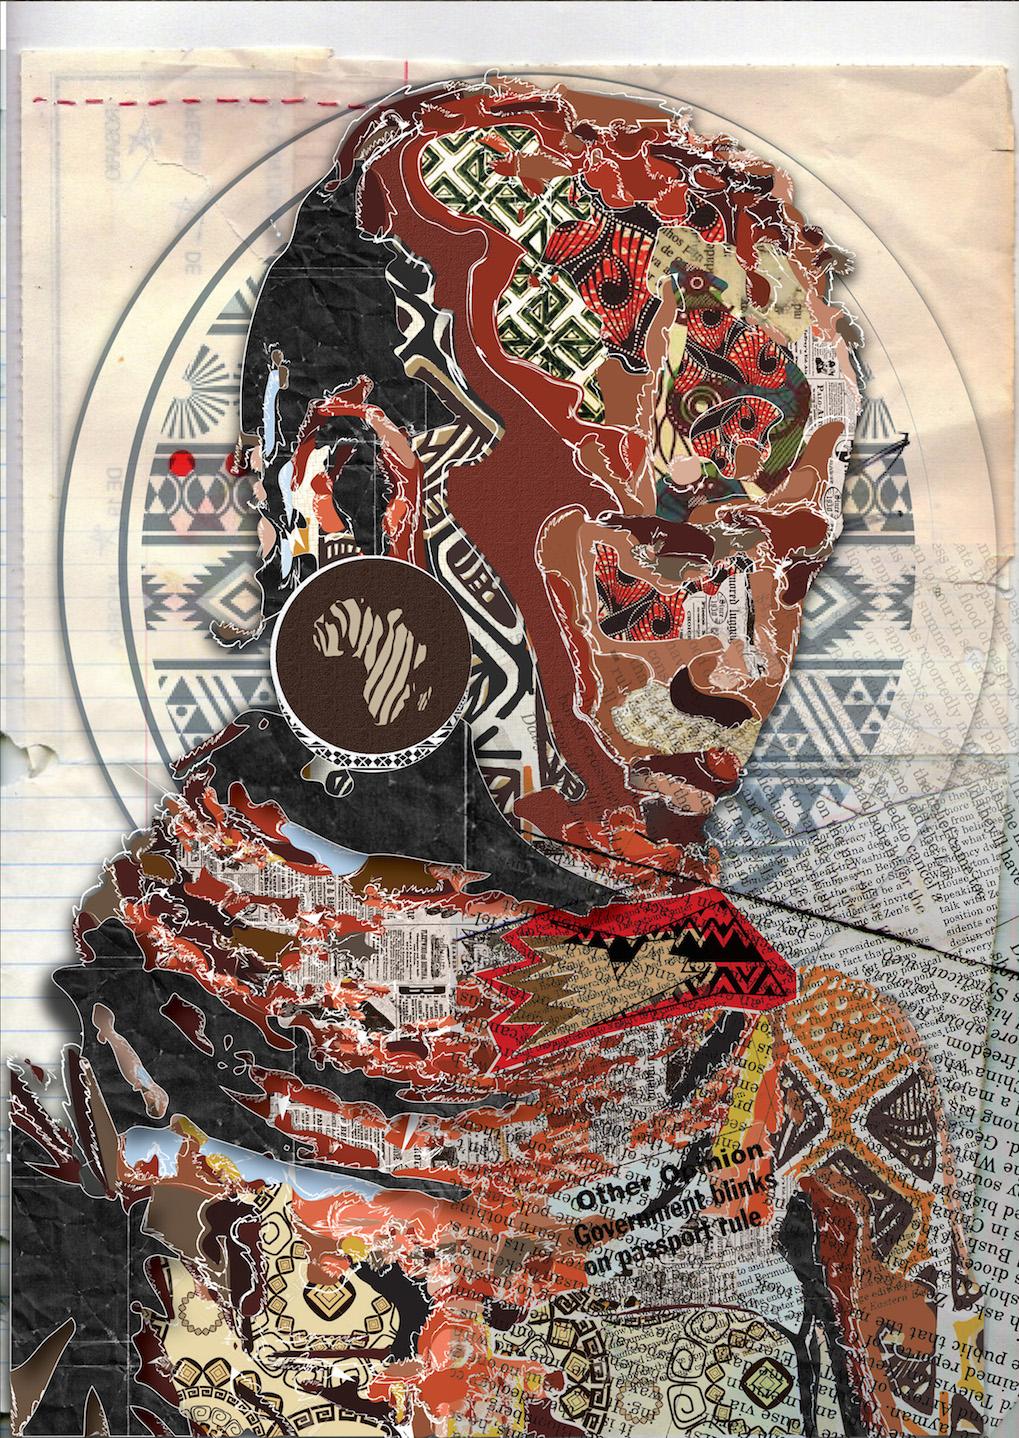 Lungile Mbokane: An emerging graphic artist telling ...